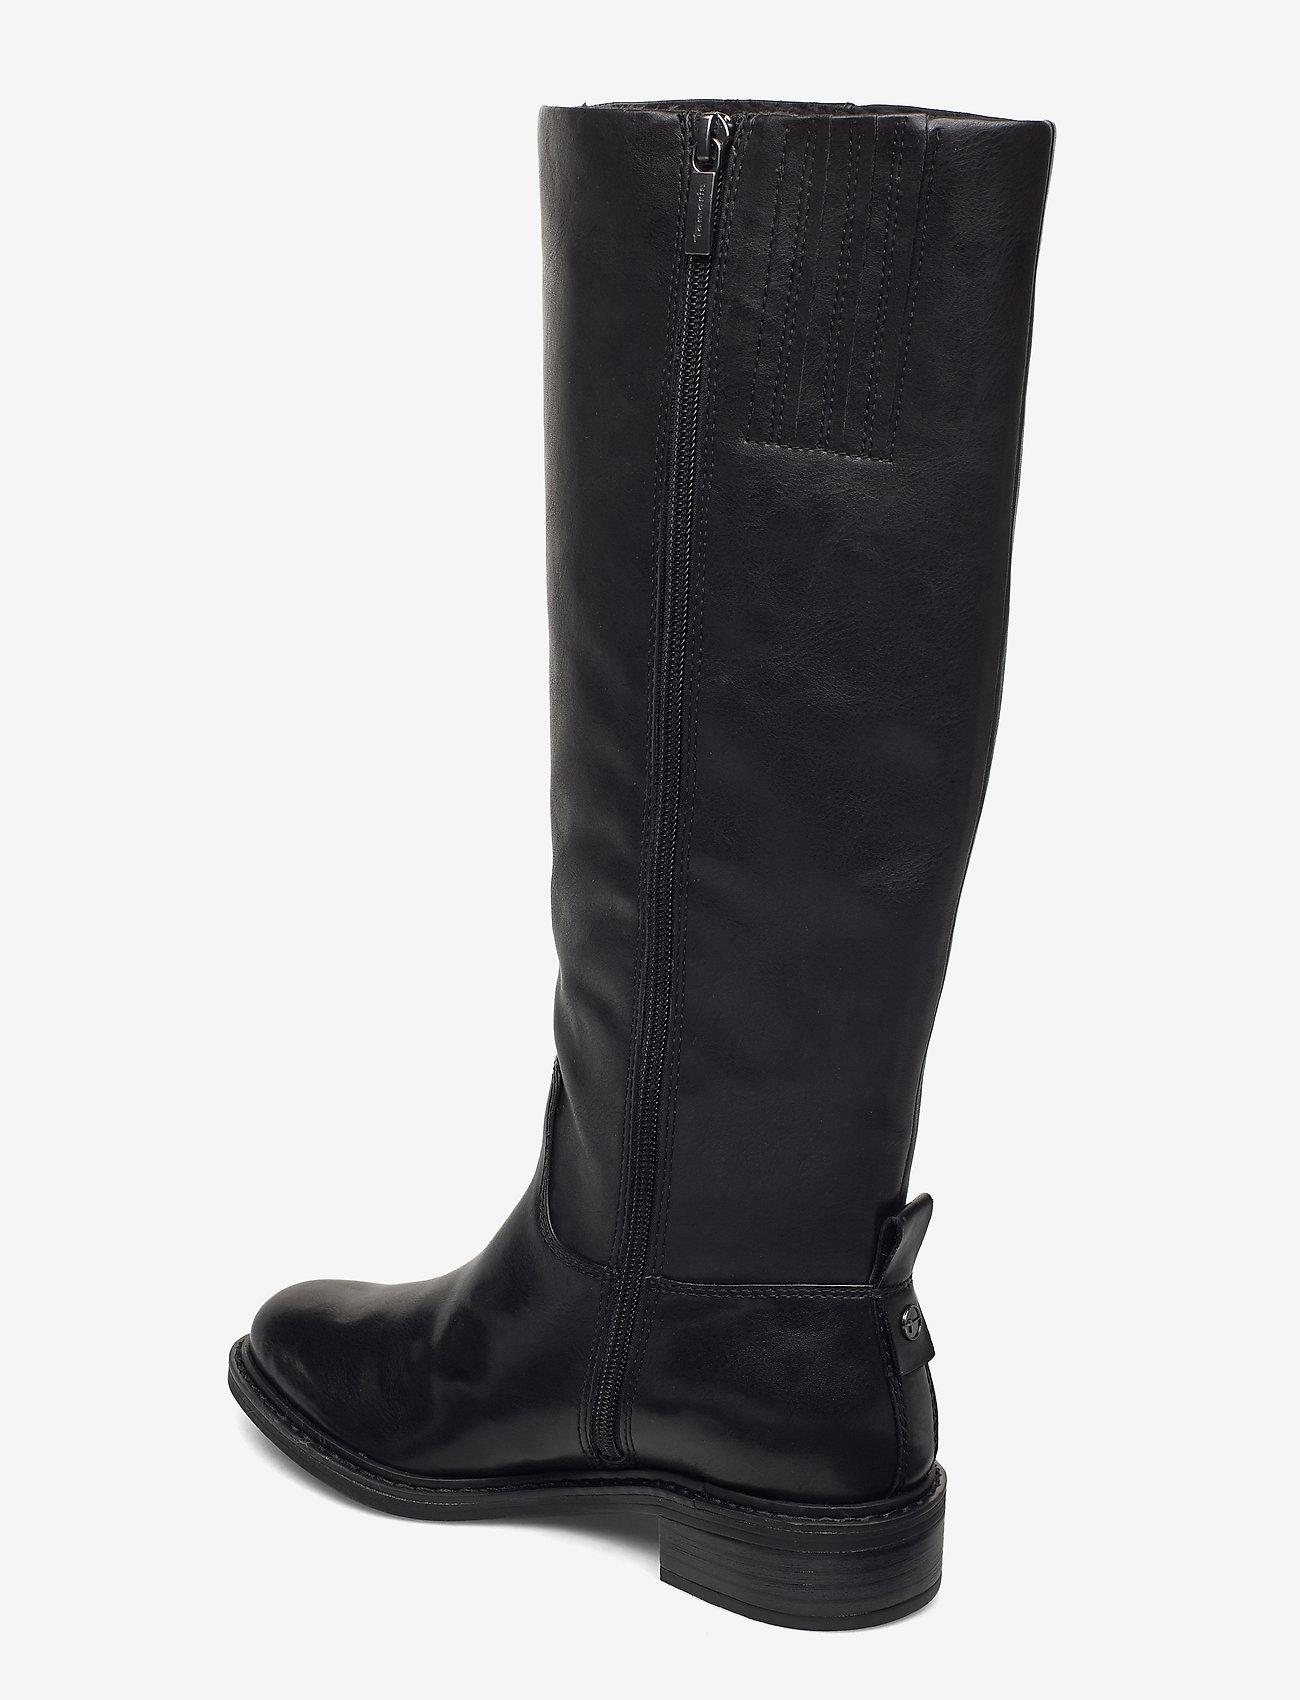 Woms Boots (Black Matt) (71.96 €) - Tamaris uakp7